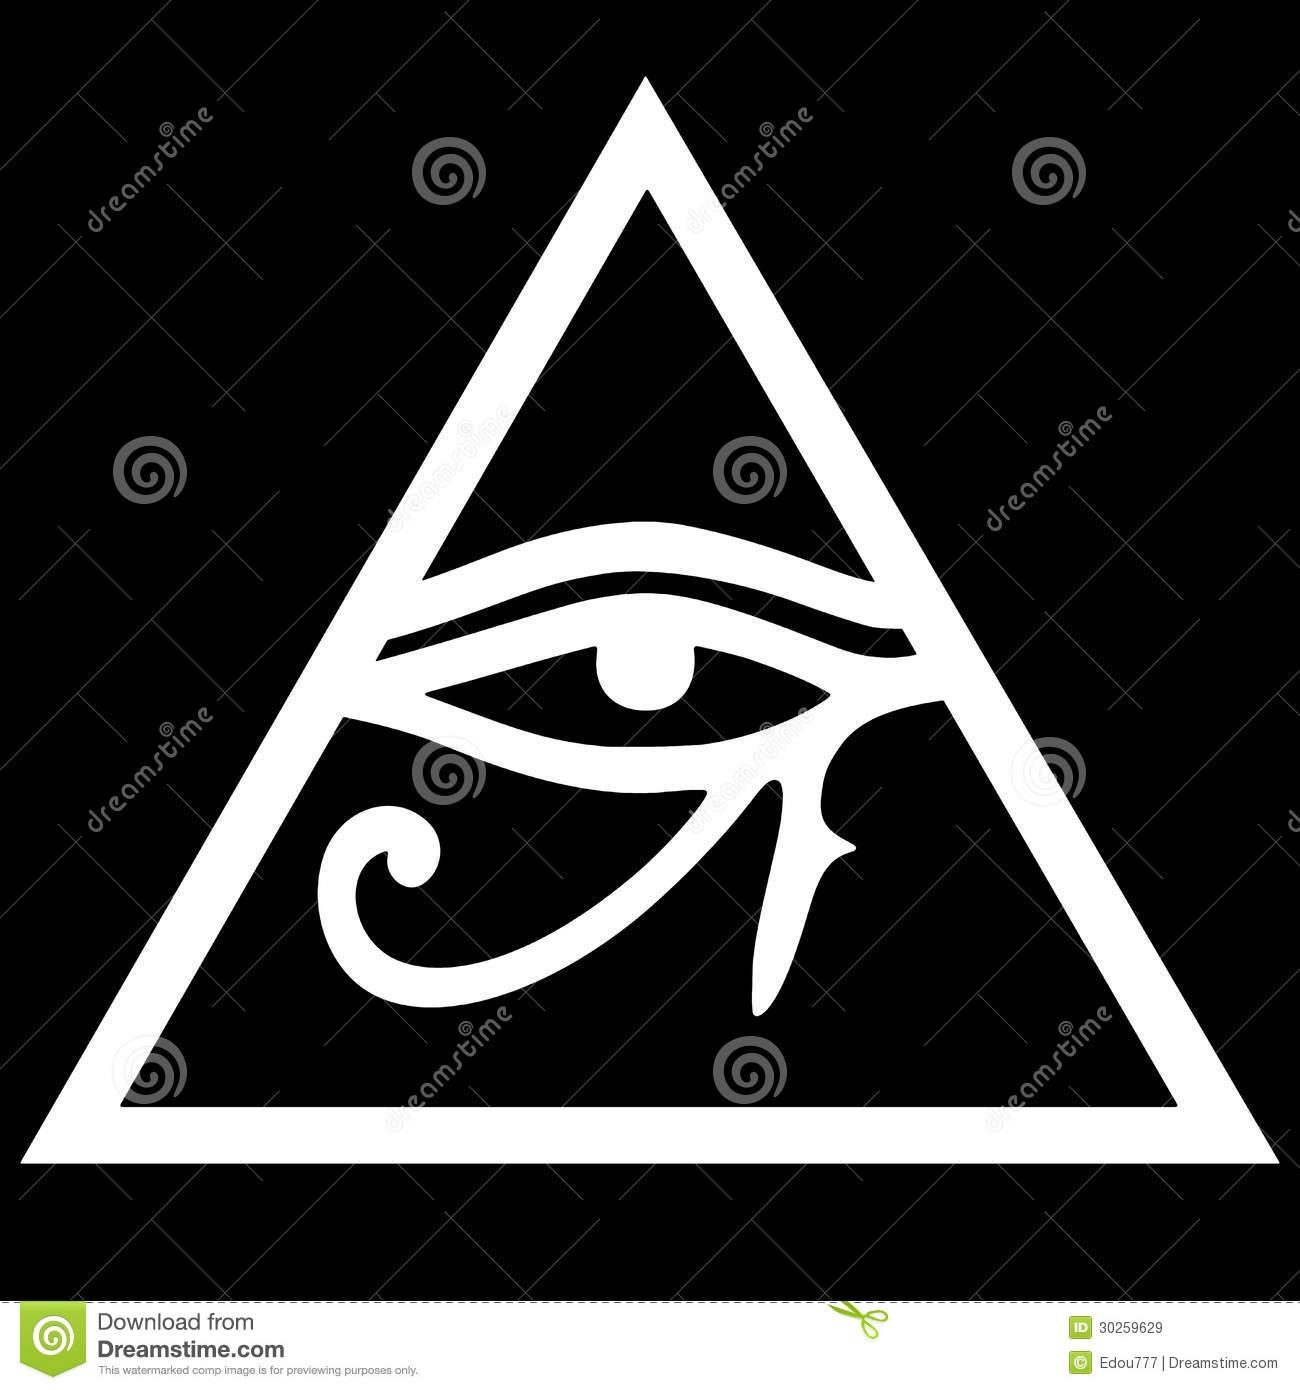 Illuminati clipart #13, Download drawings